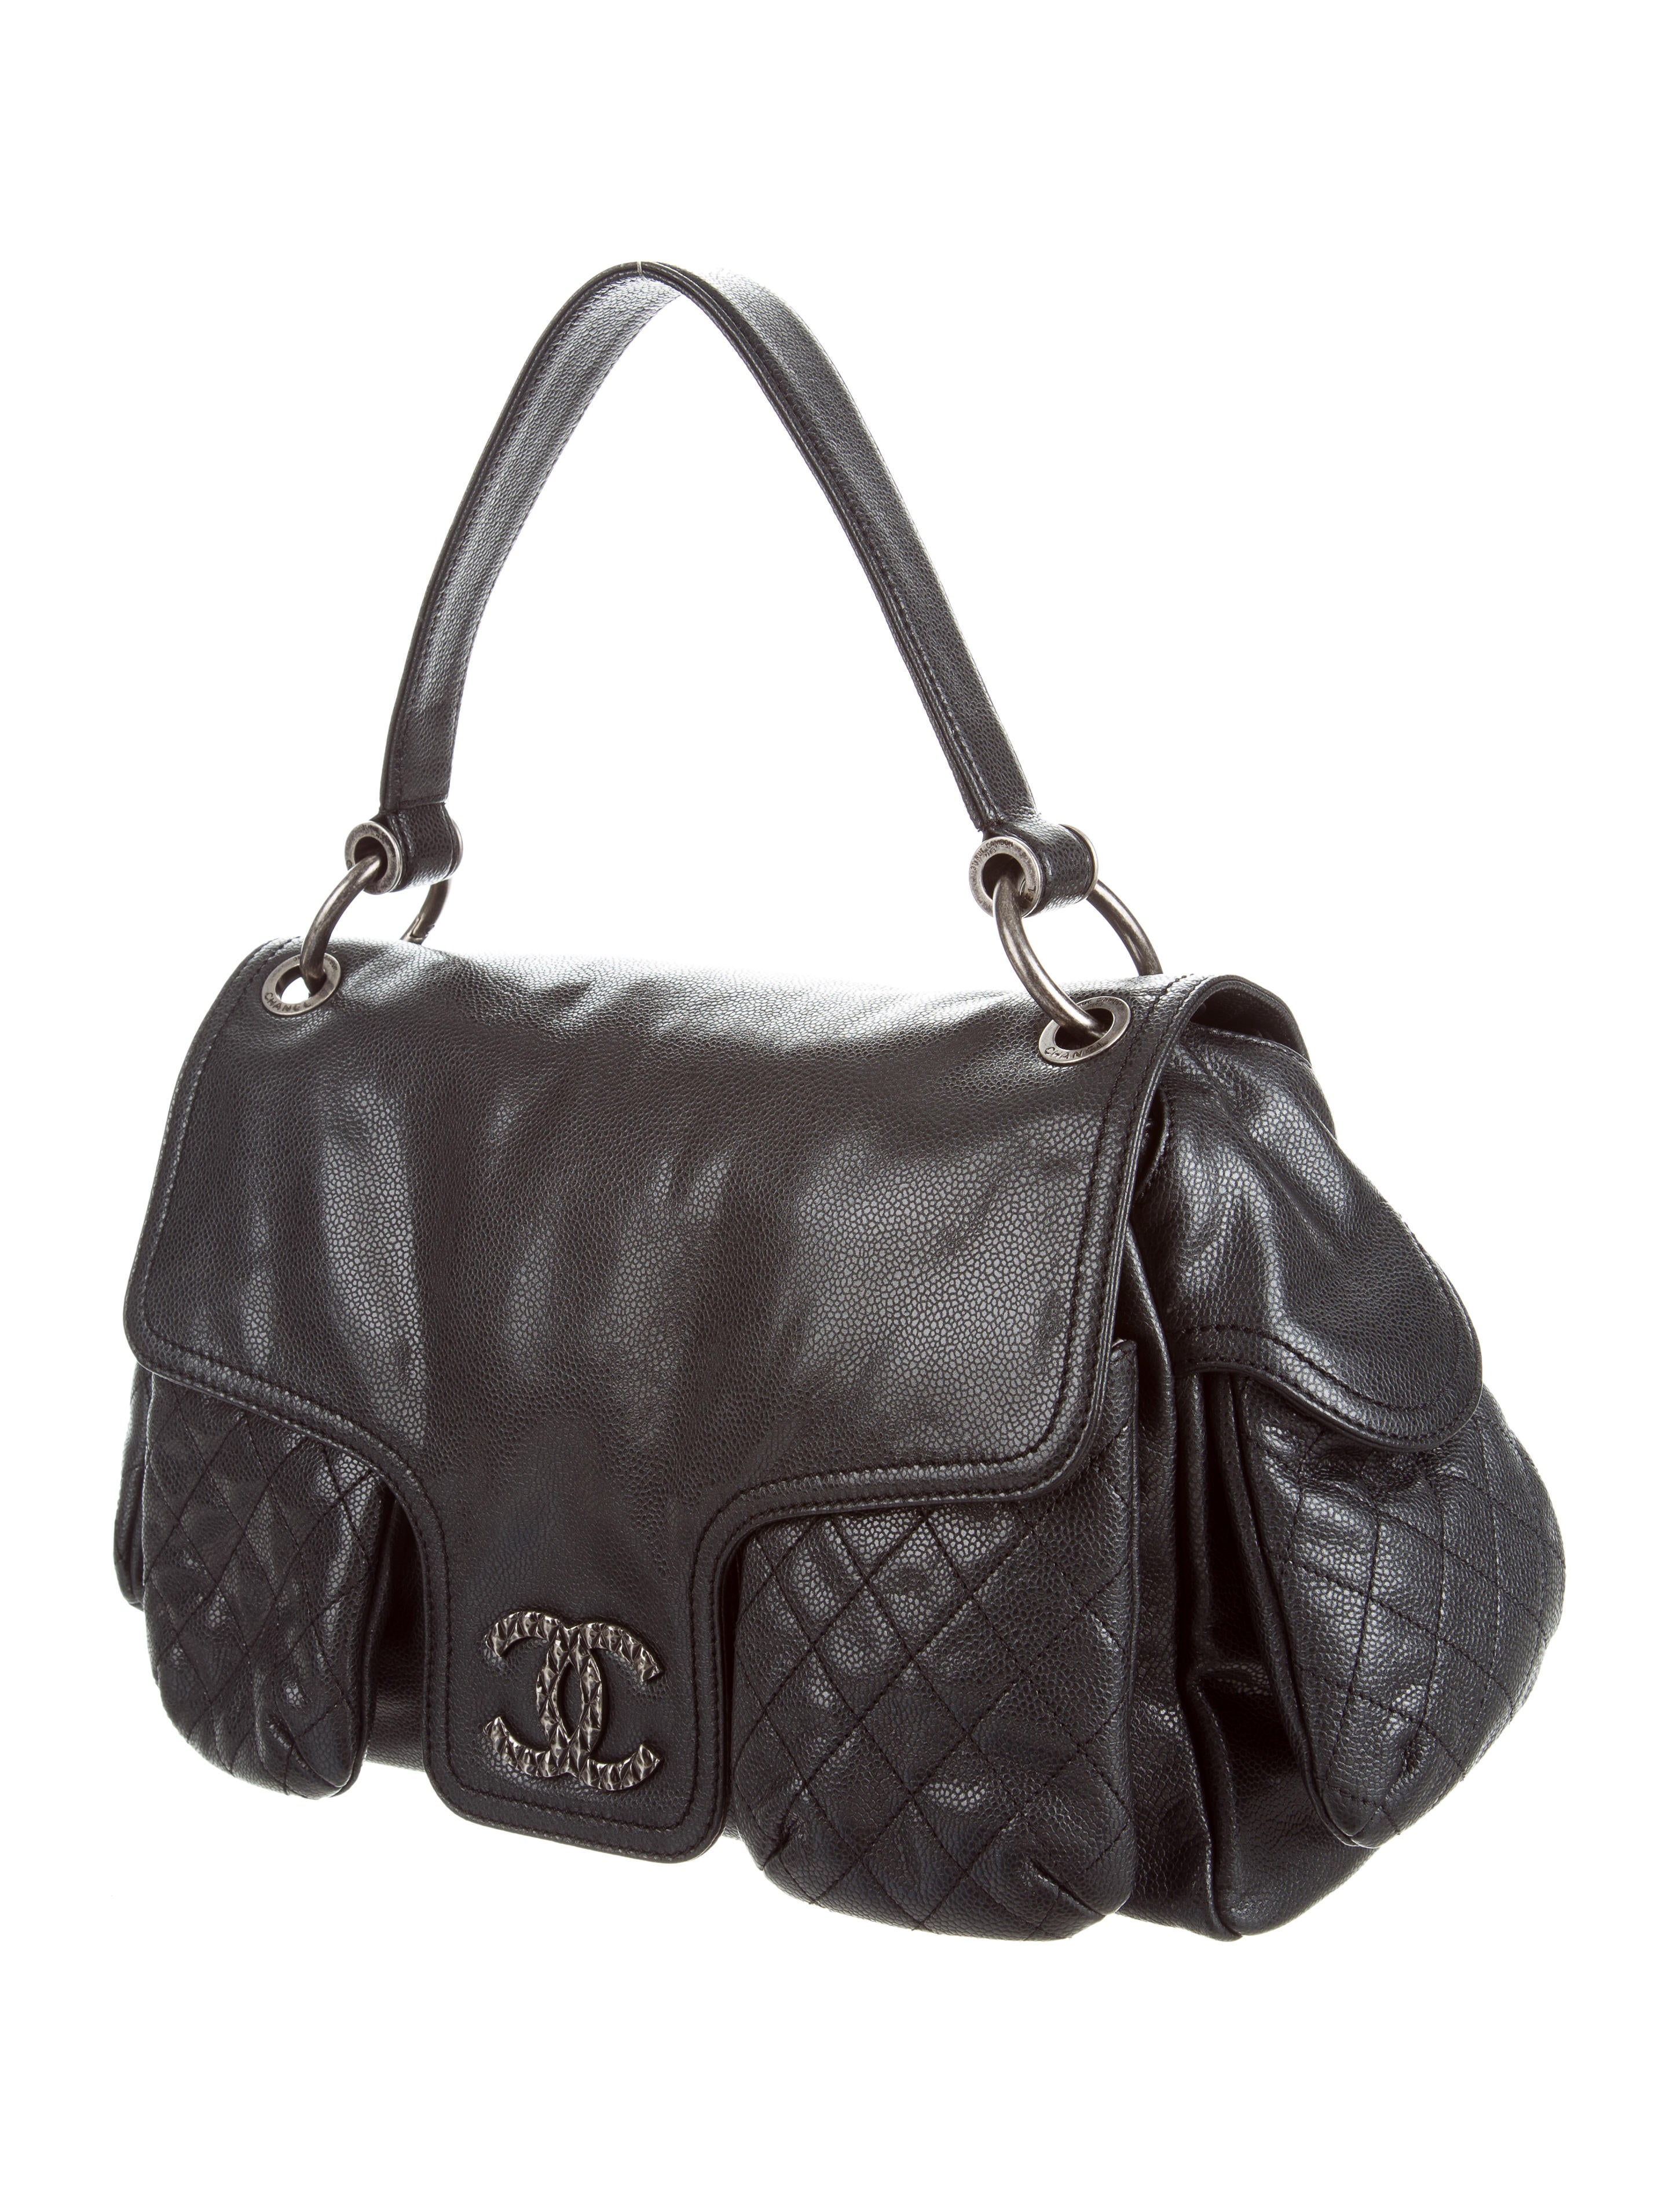 Chanel Coco Rider Flap Bag - Handbags - CHA178342 | The ...